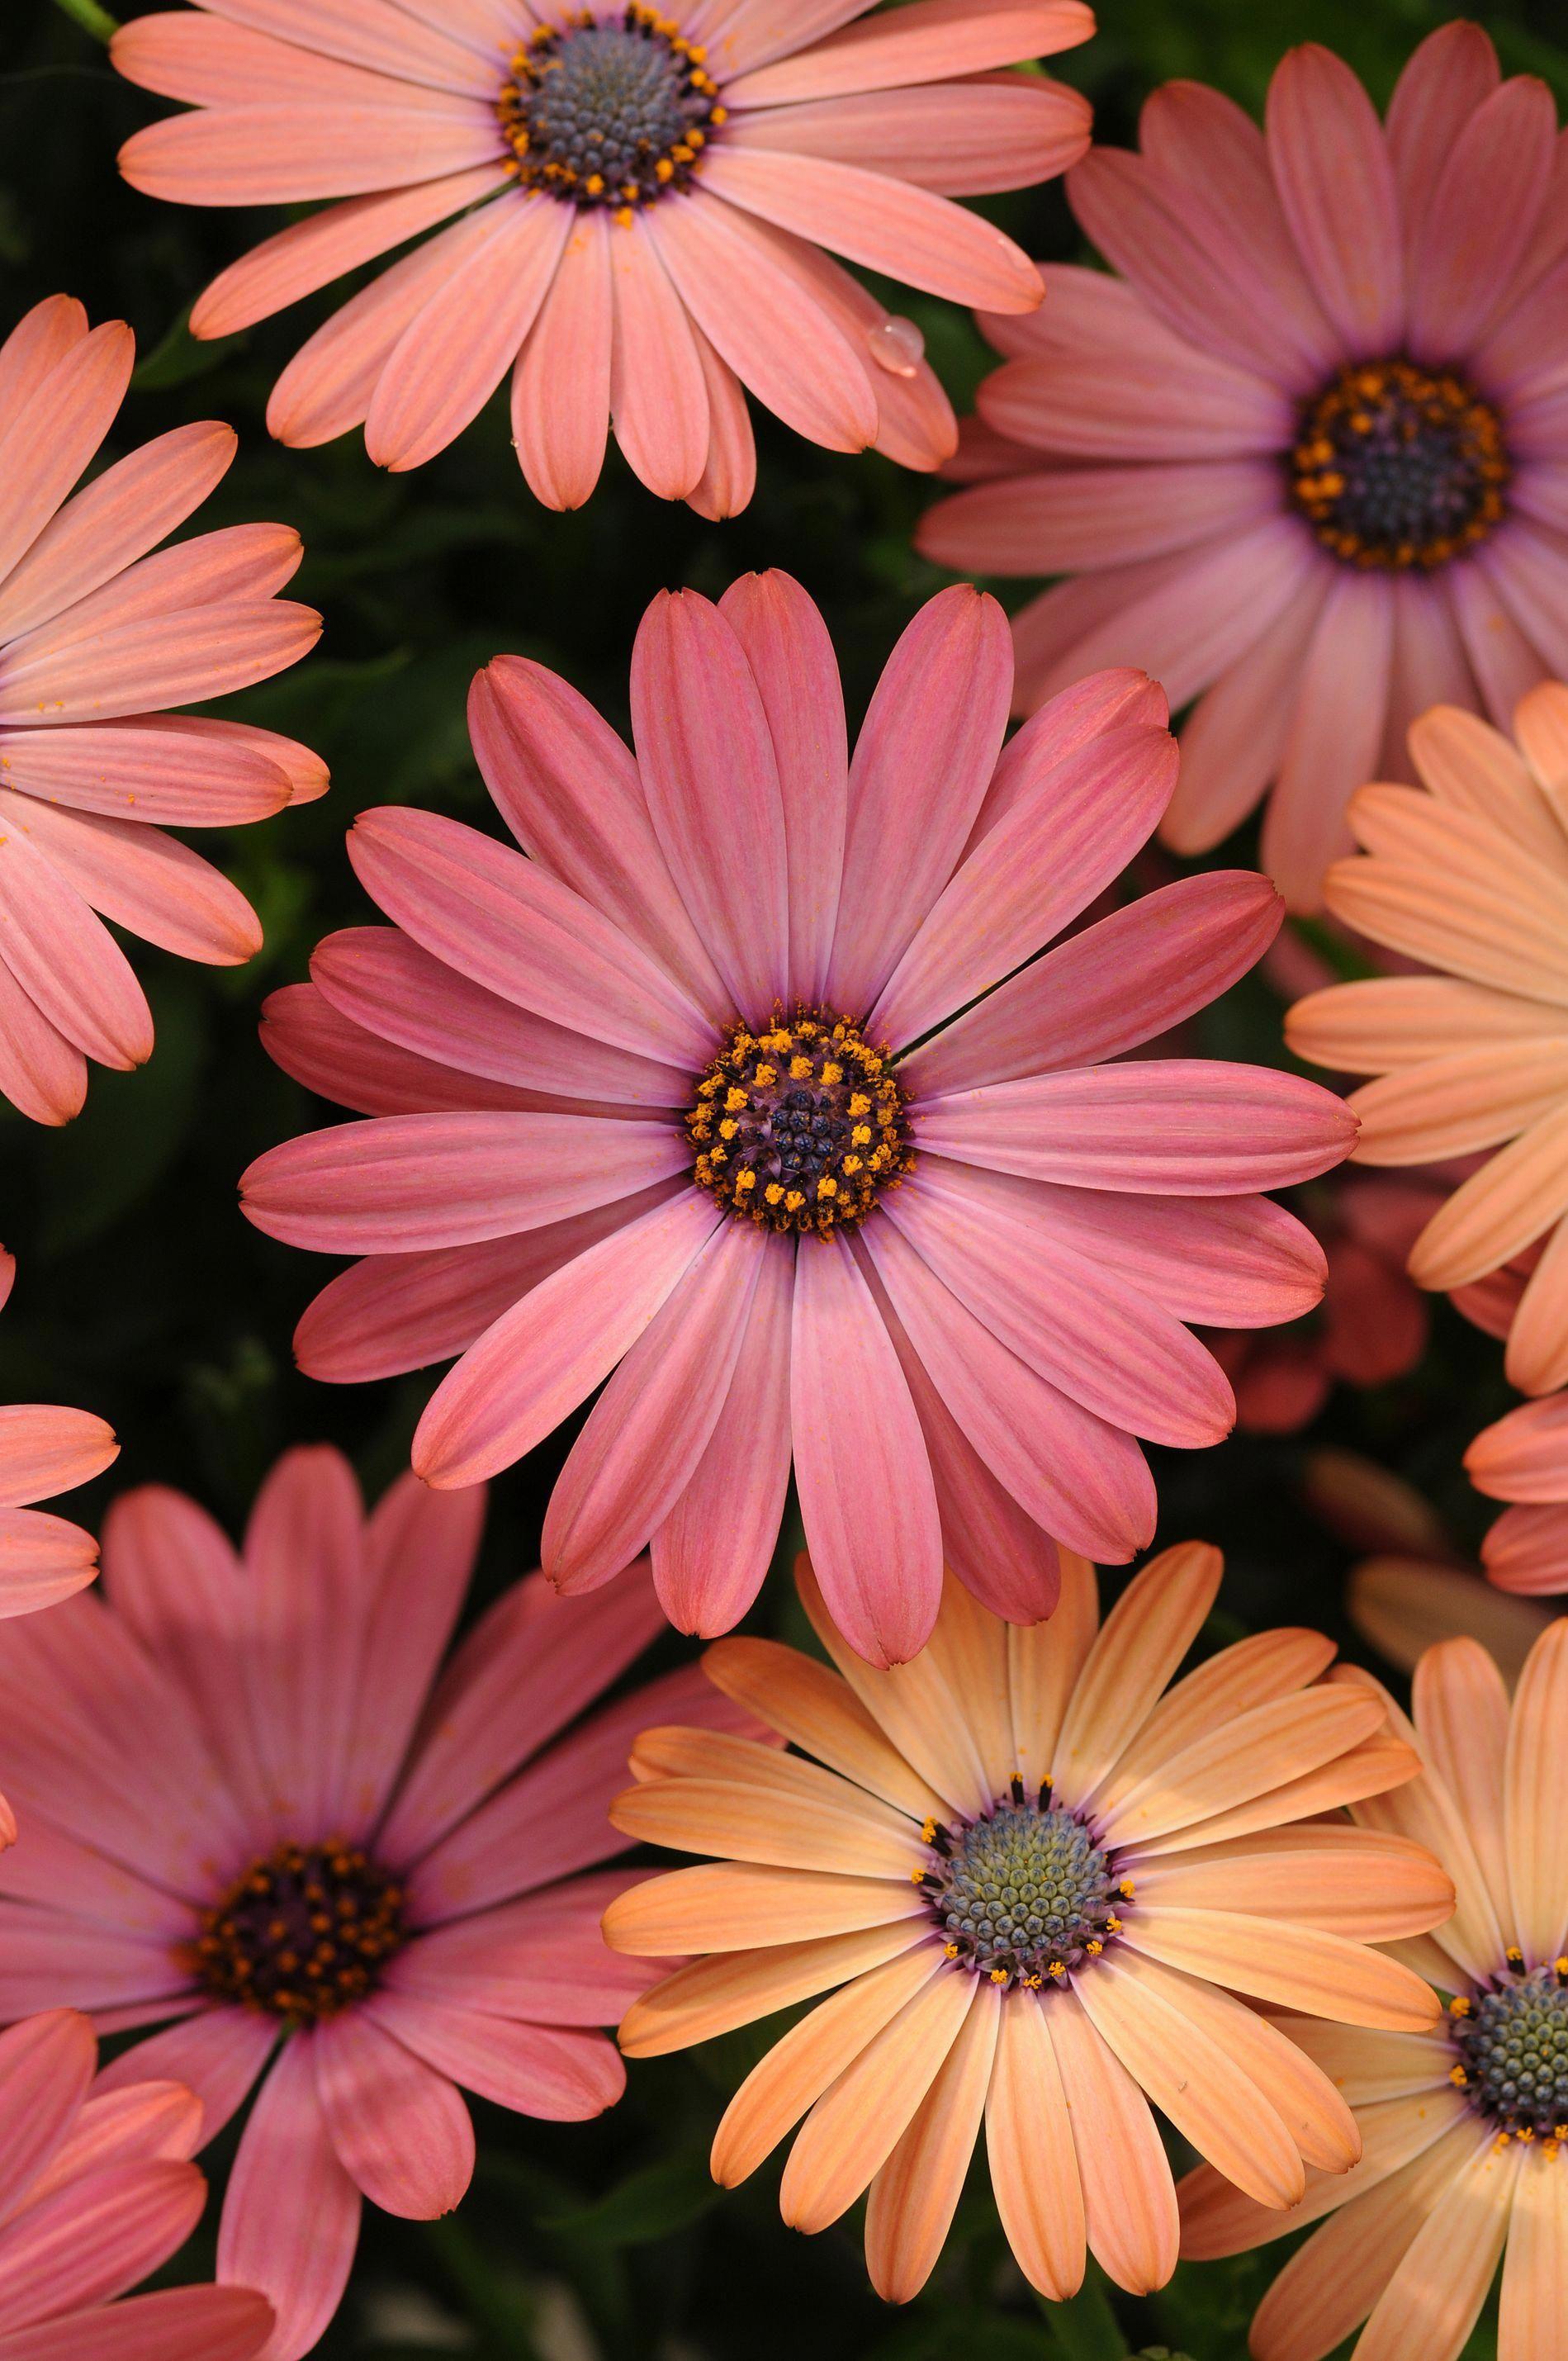 Osteospermum - Serenity Rose Magic, Ball Horticultural Co ...